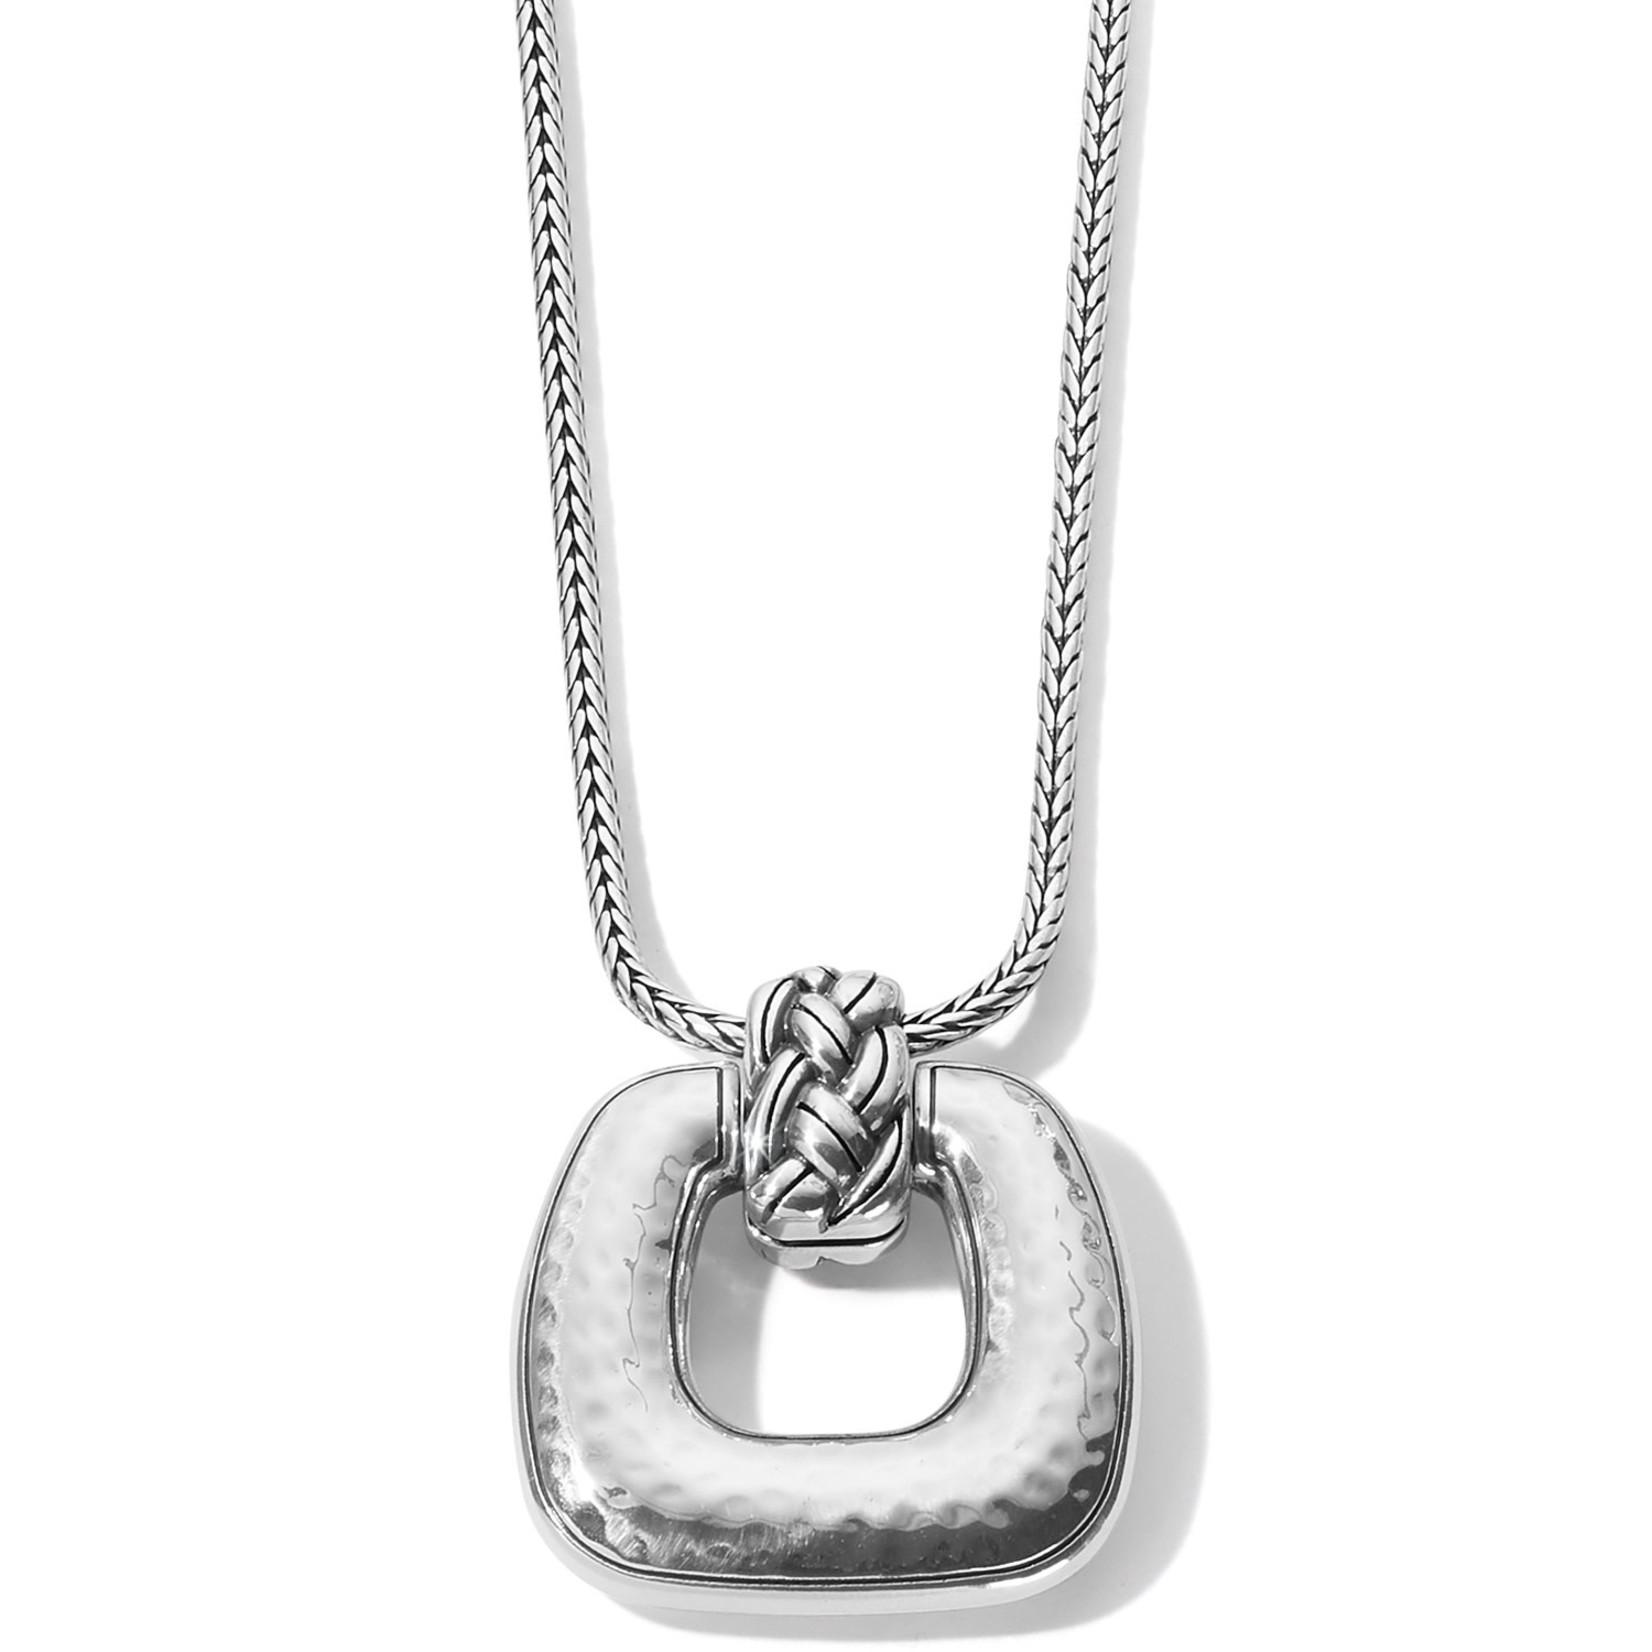 Brighton JM3480 Interlok Woven Necklace